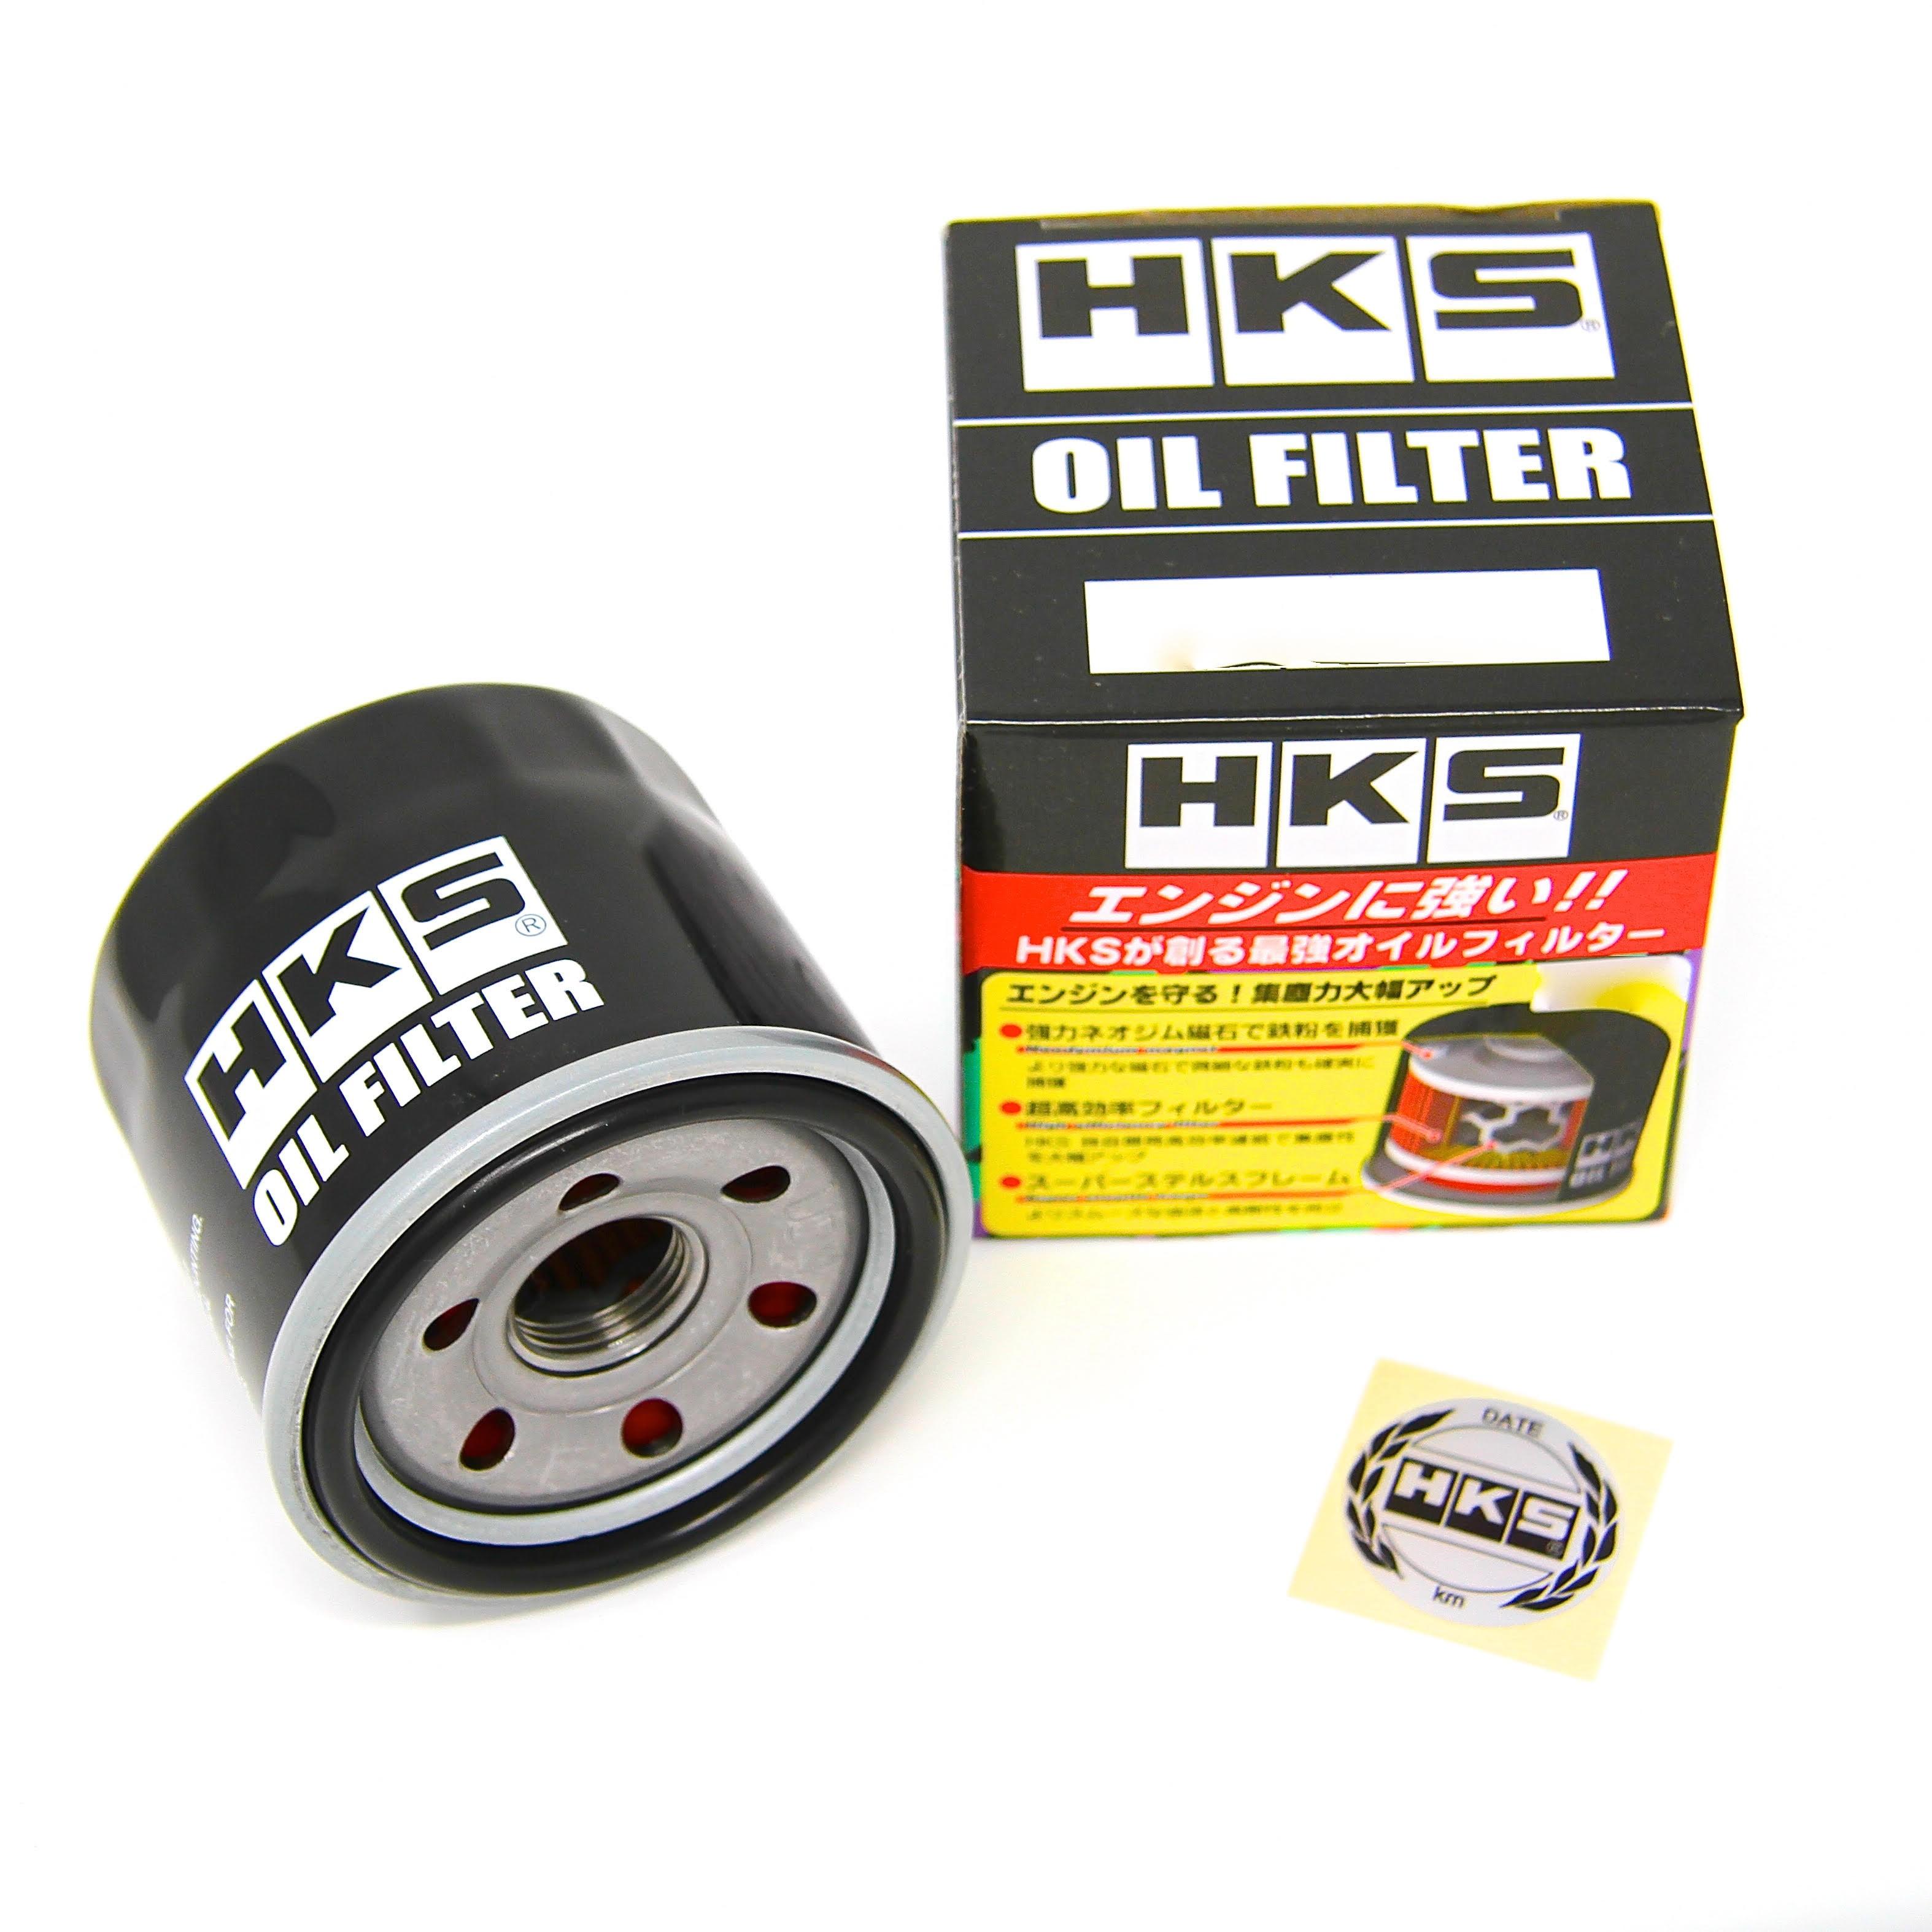 HKS Hybrid Sports Oil Filter UNF3/4-16